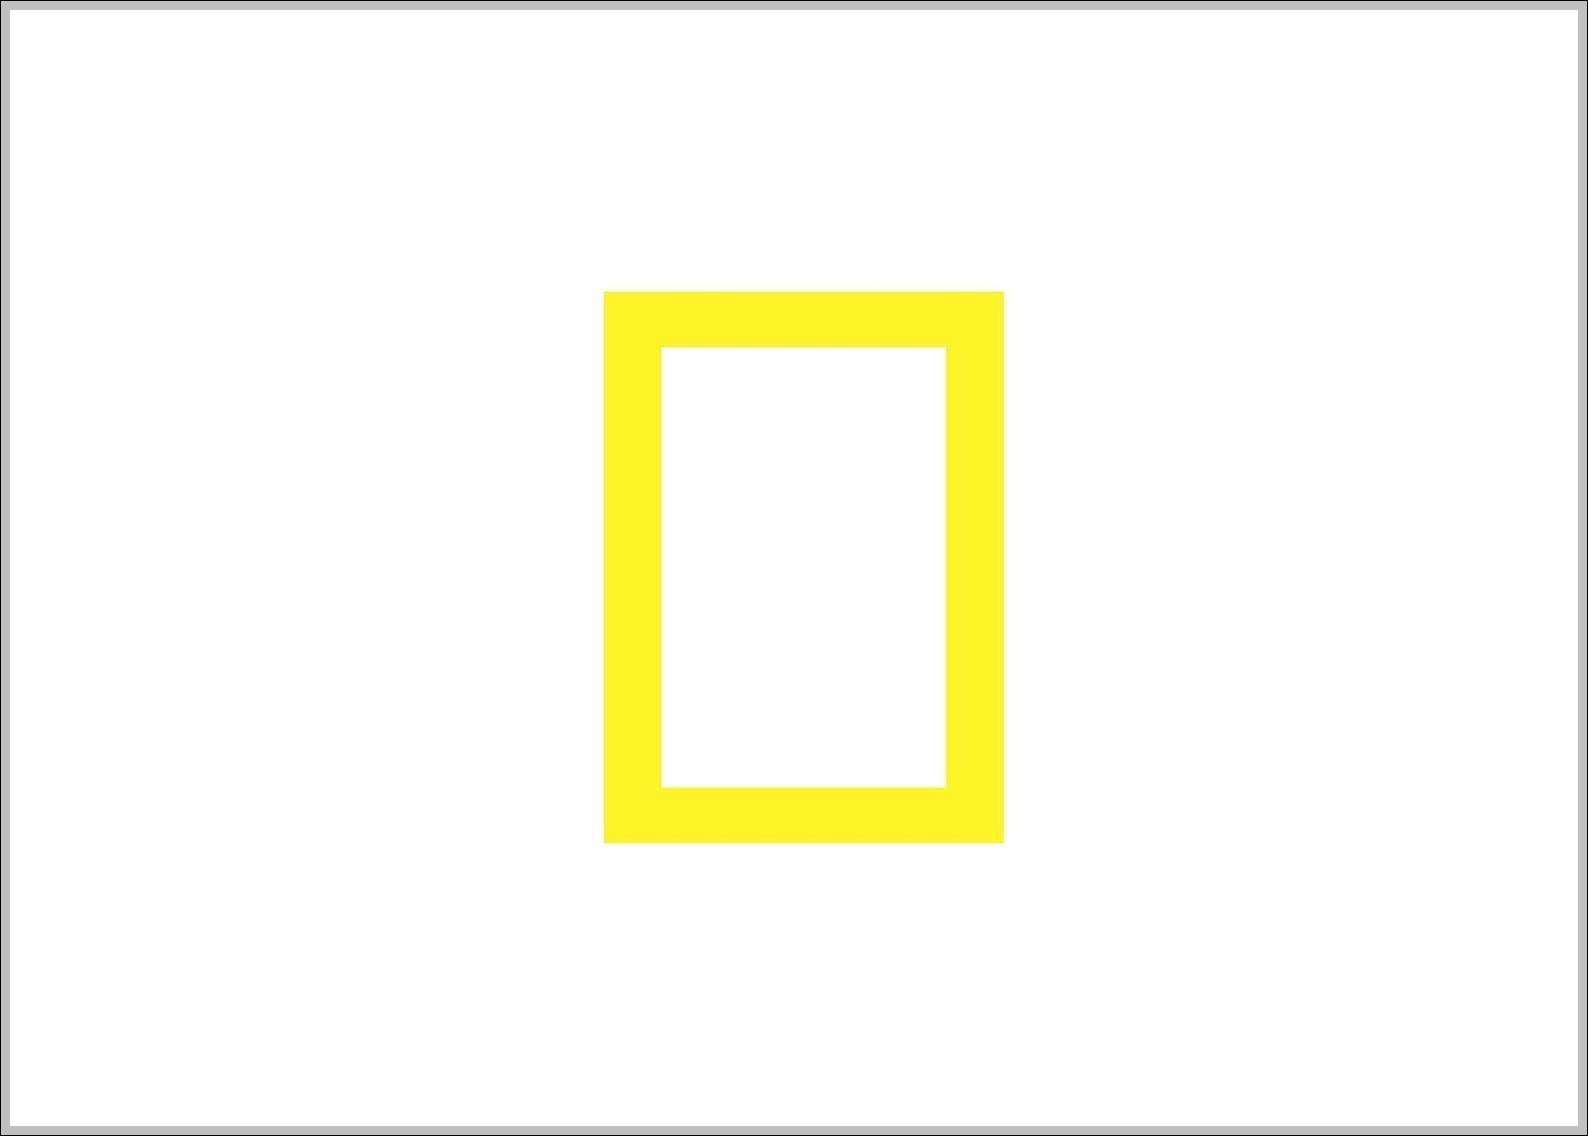 National Geographic Logo Yellow Frame Logo Sign Logos Signs